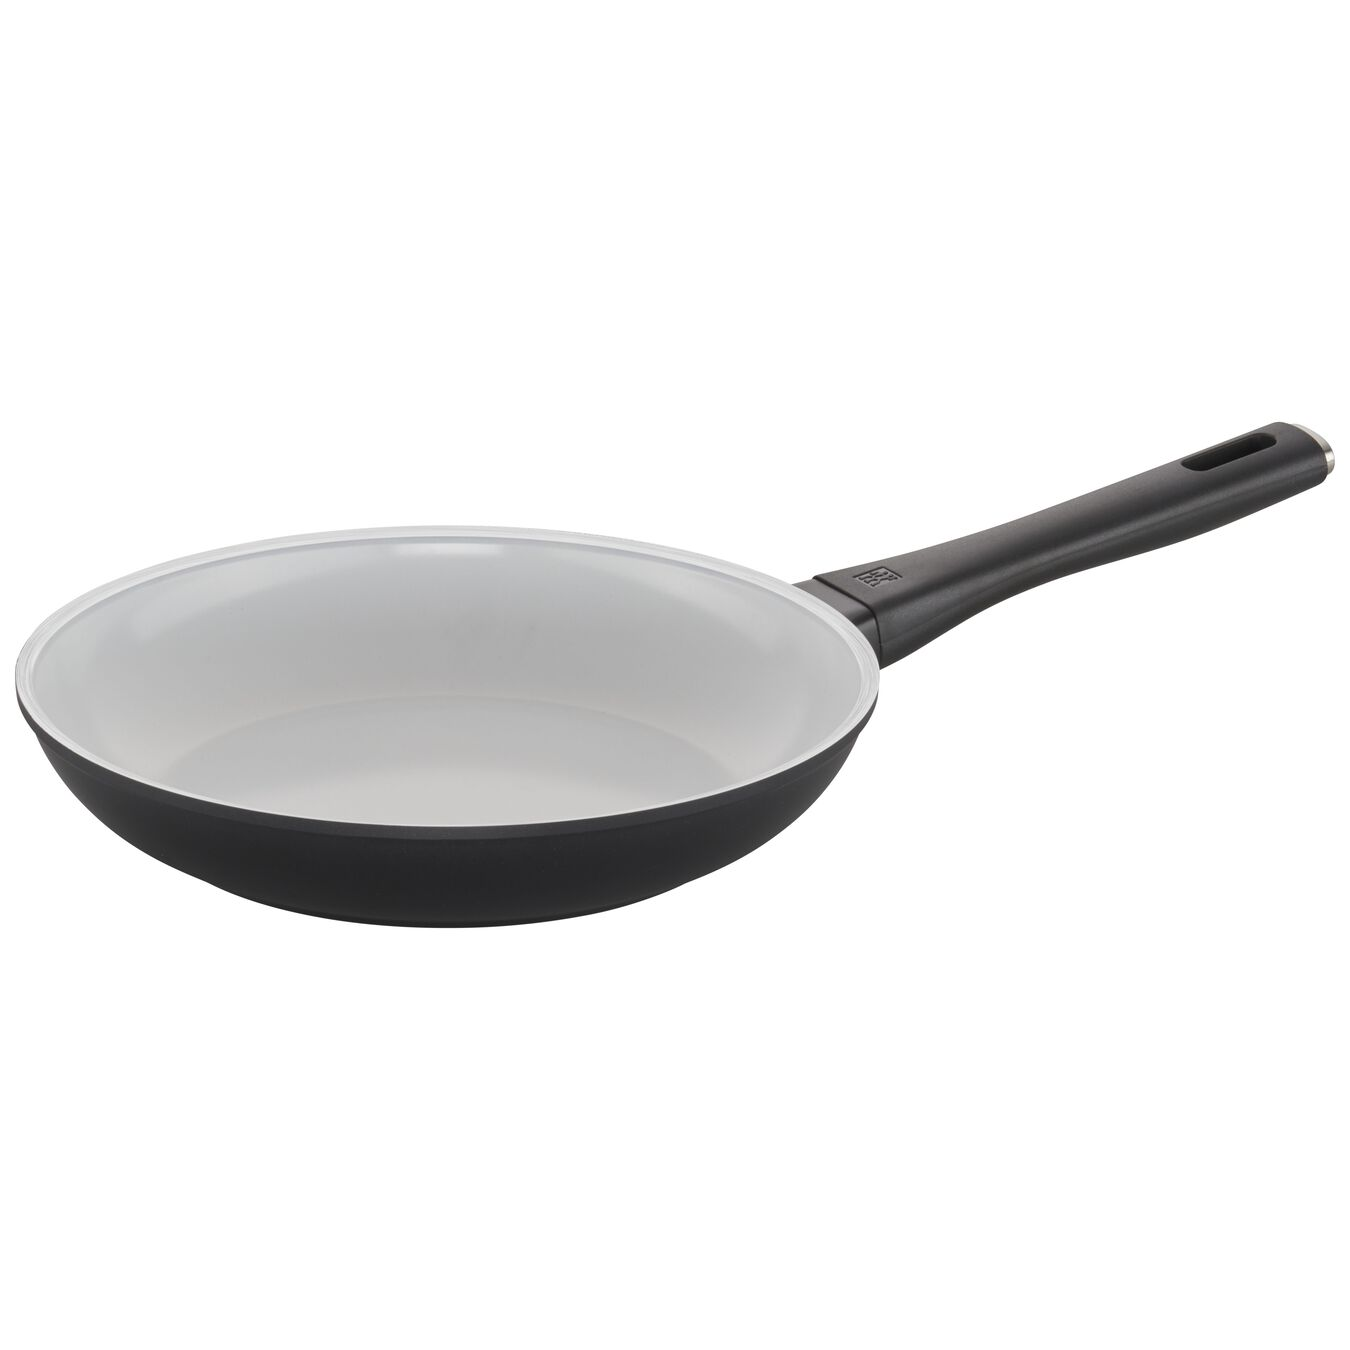 10-inch, Aluminium, Ceramic, Non-stick, Frying pan,,large 2